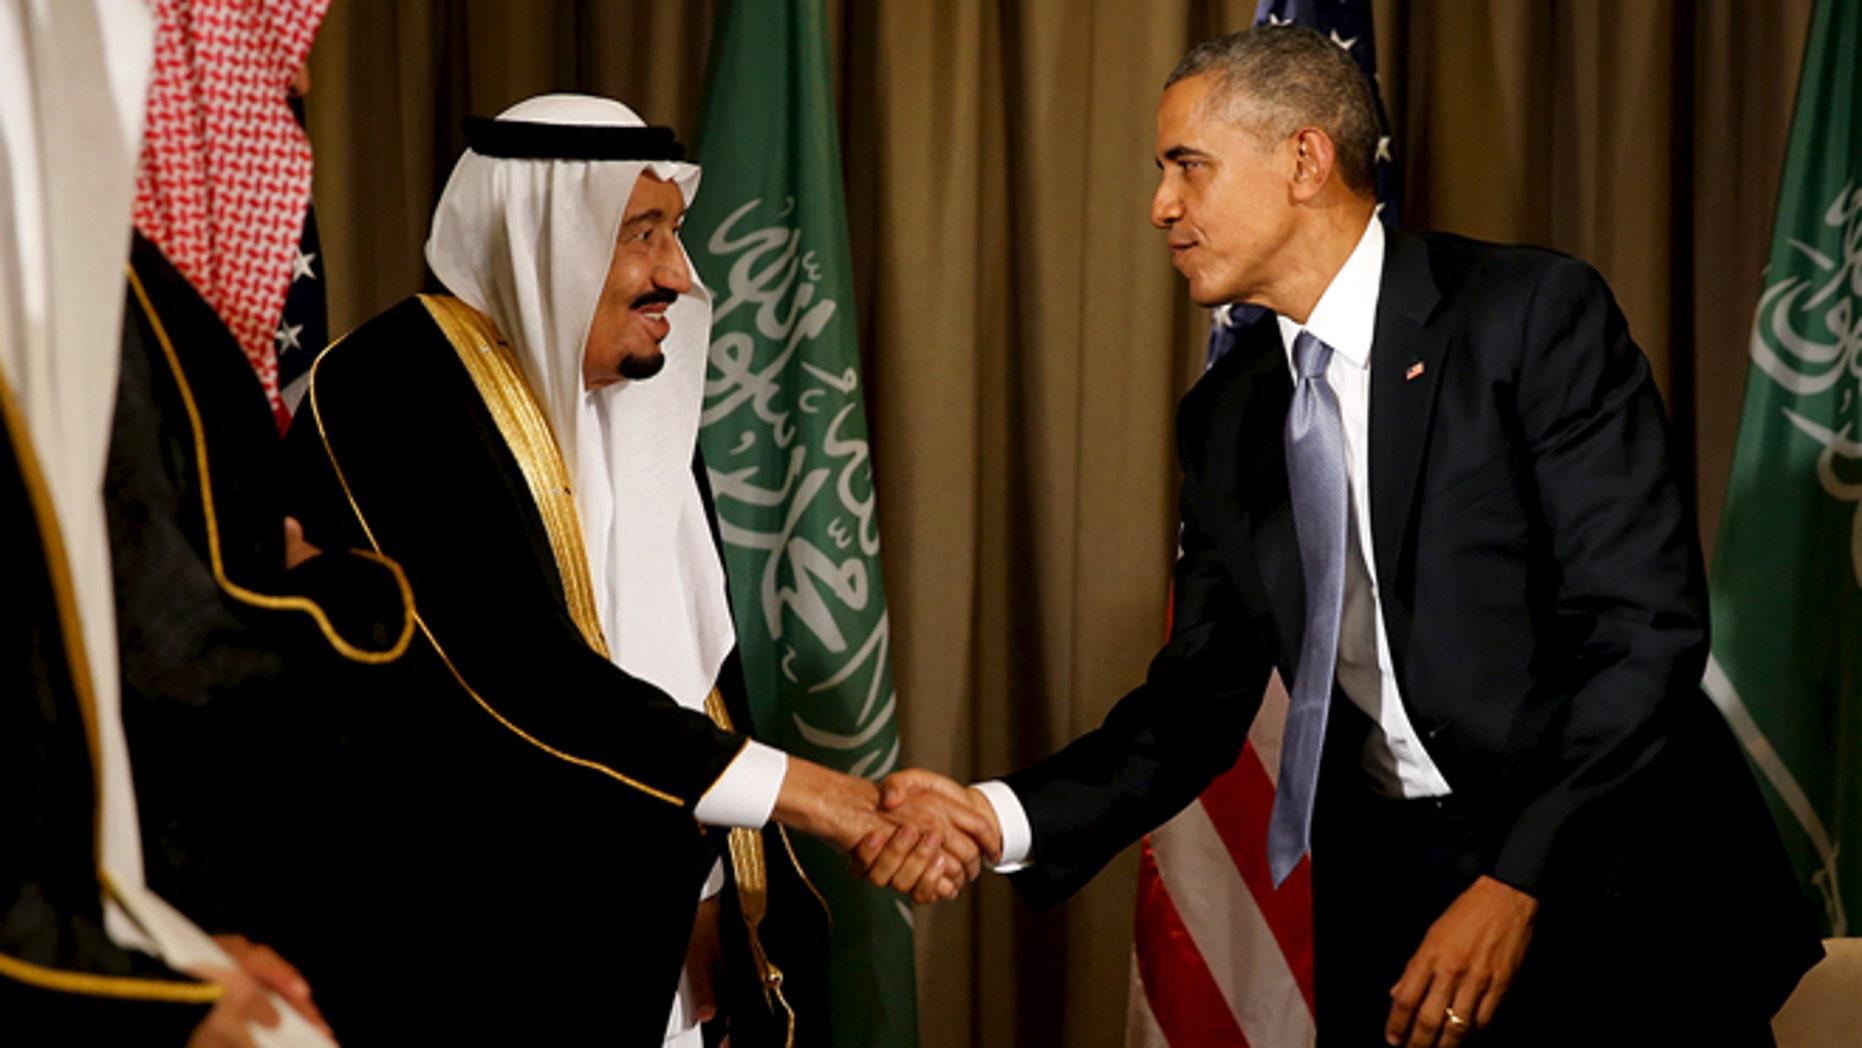 President Barack Obama shakes hands with Saudi Arabia's King Salman after their meeting alongside the G20 summit at the Regnum Carya Resort in Antalya, Turkey, November 15, 2015. (REUTERS/Jonathan Ernst)